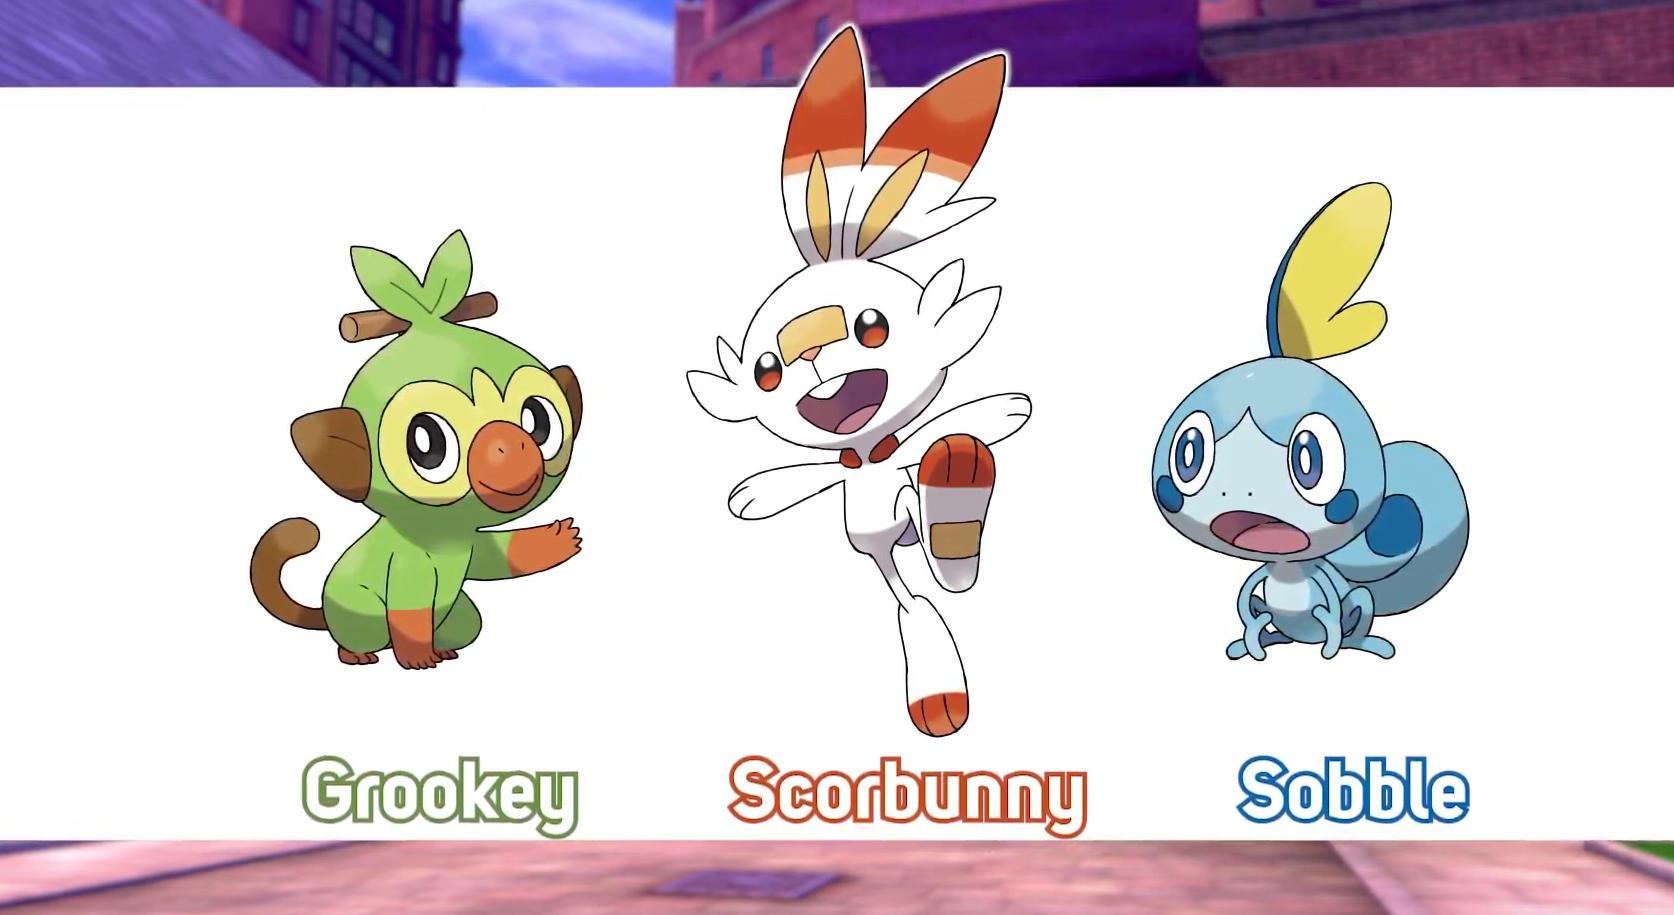 Pokemon Sword and Shield Starter Pokemon and Evolutions of Sobble Scorbunny Grookey